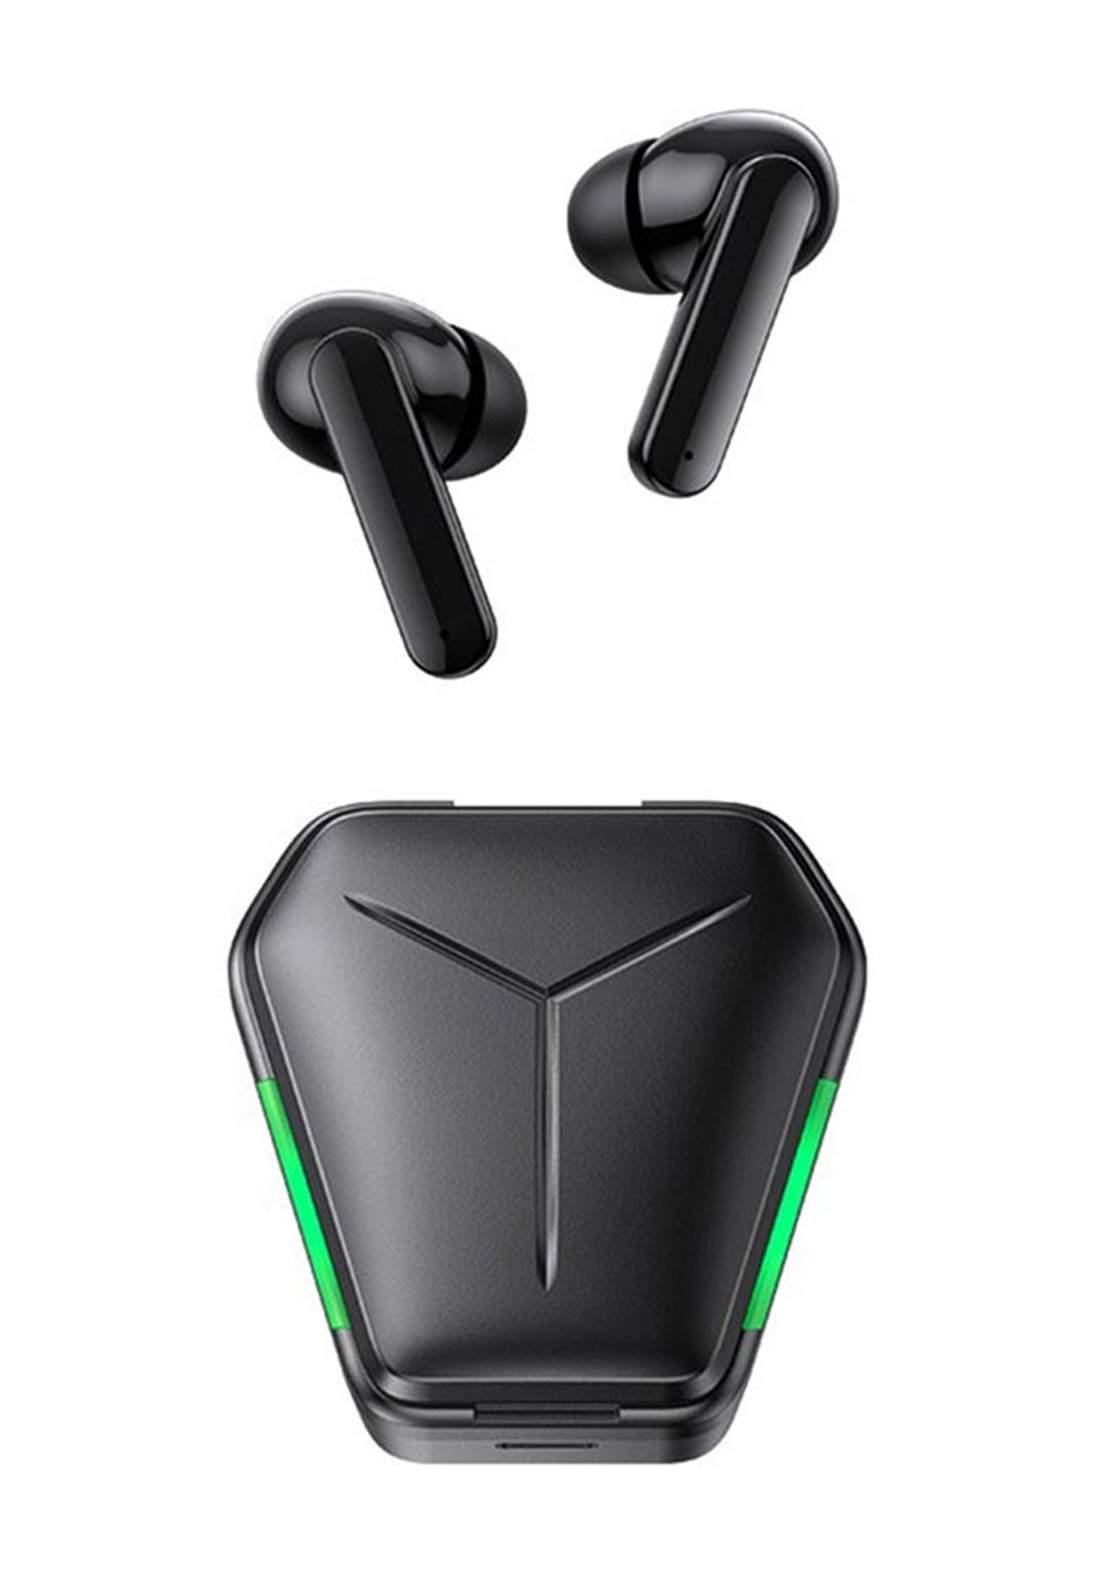 Usams Jy01 Mobile Gaming  Headphones - Black